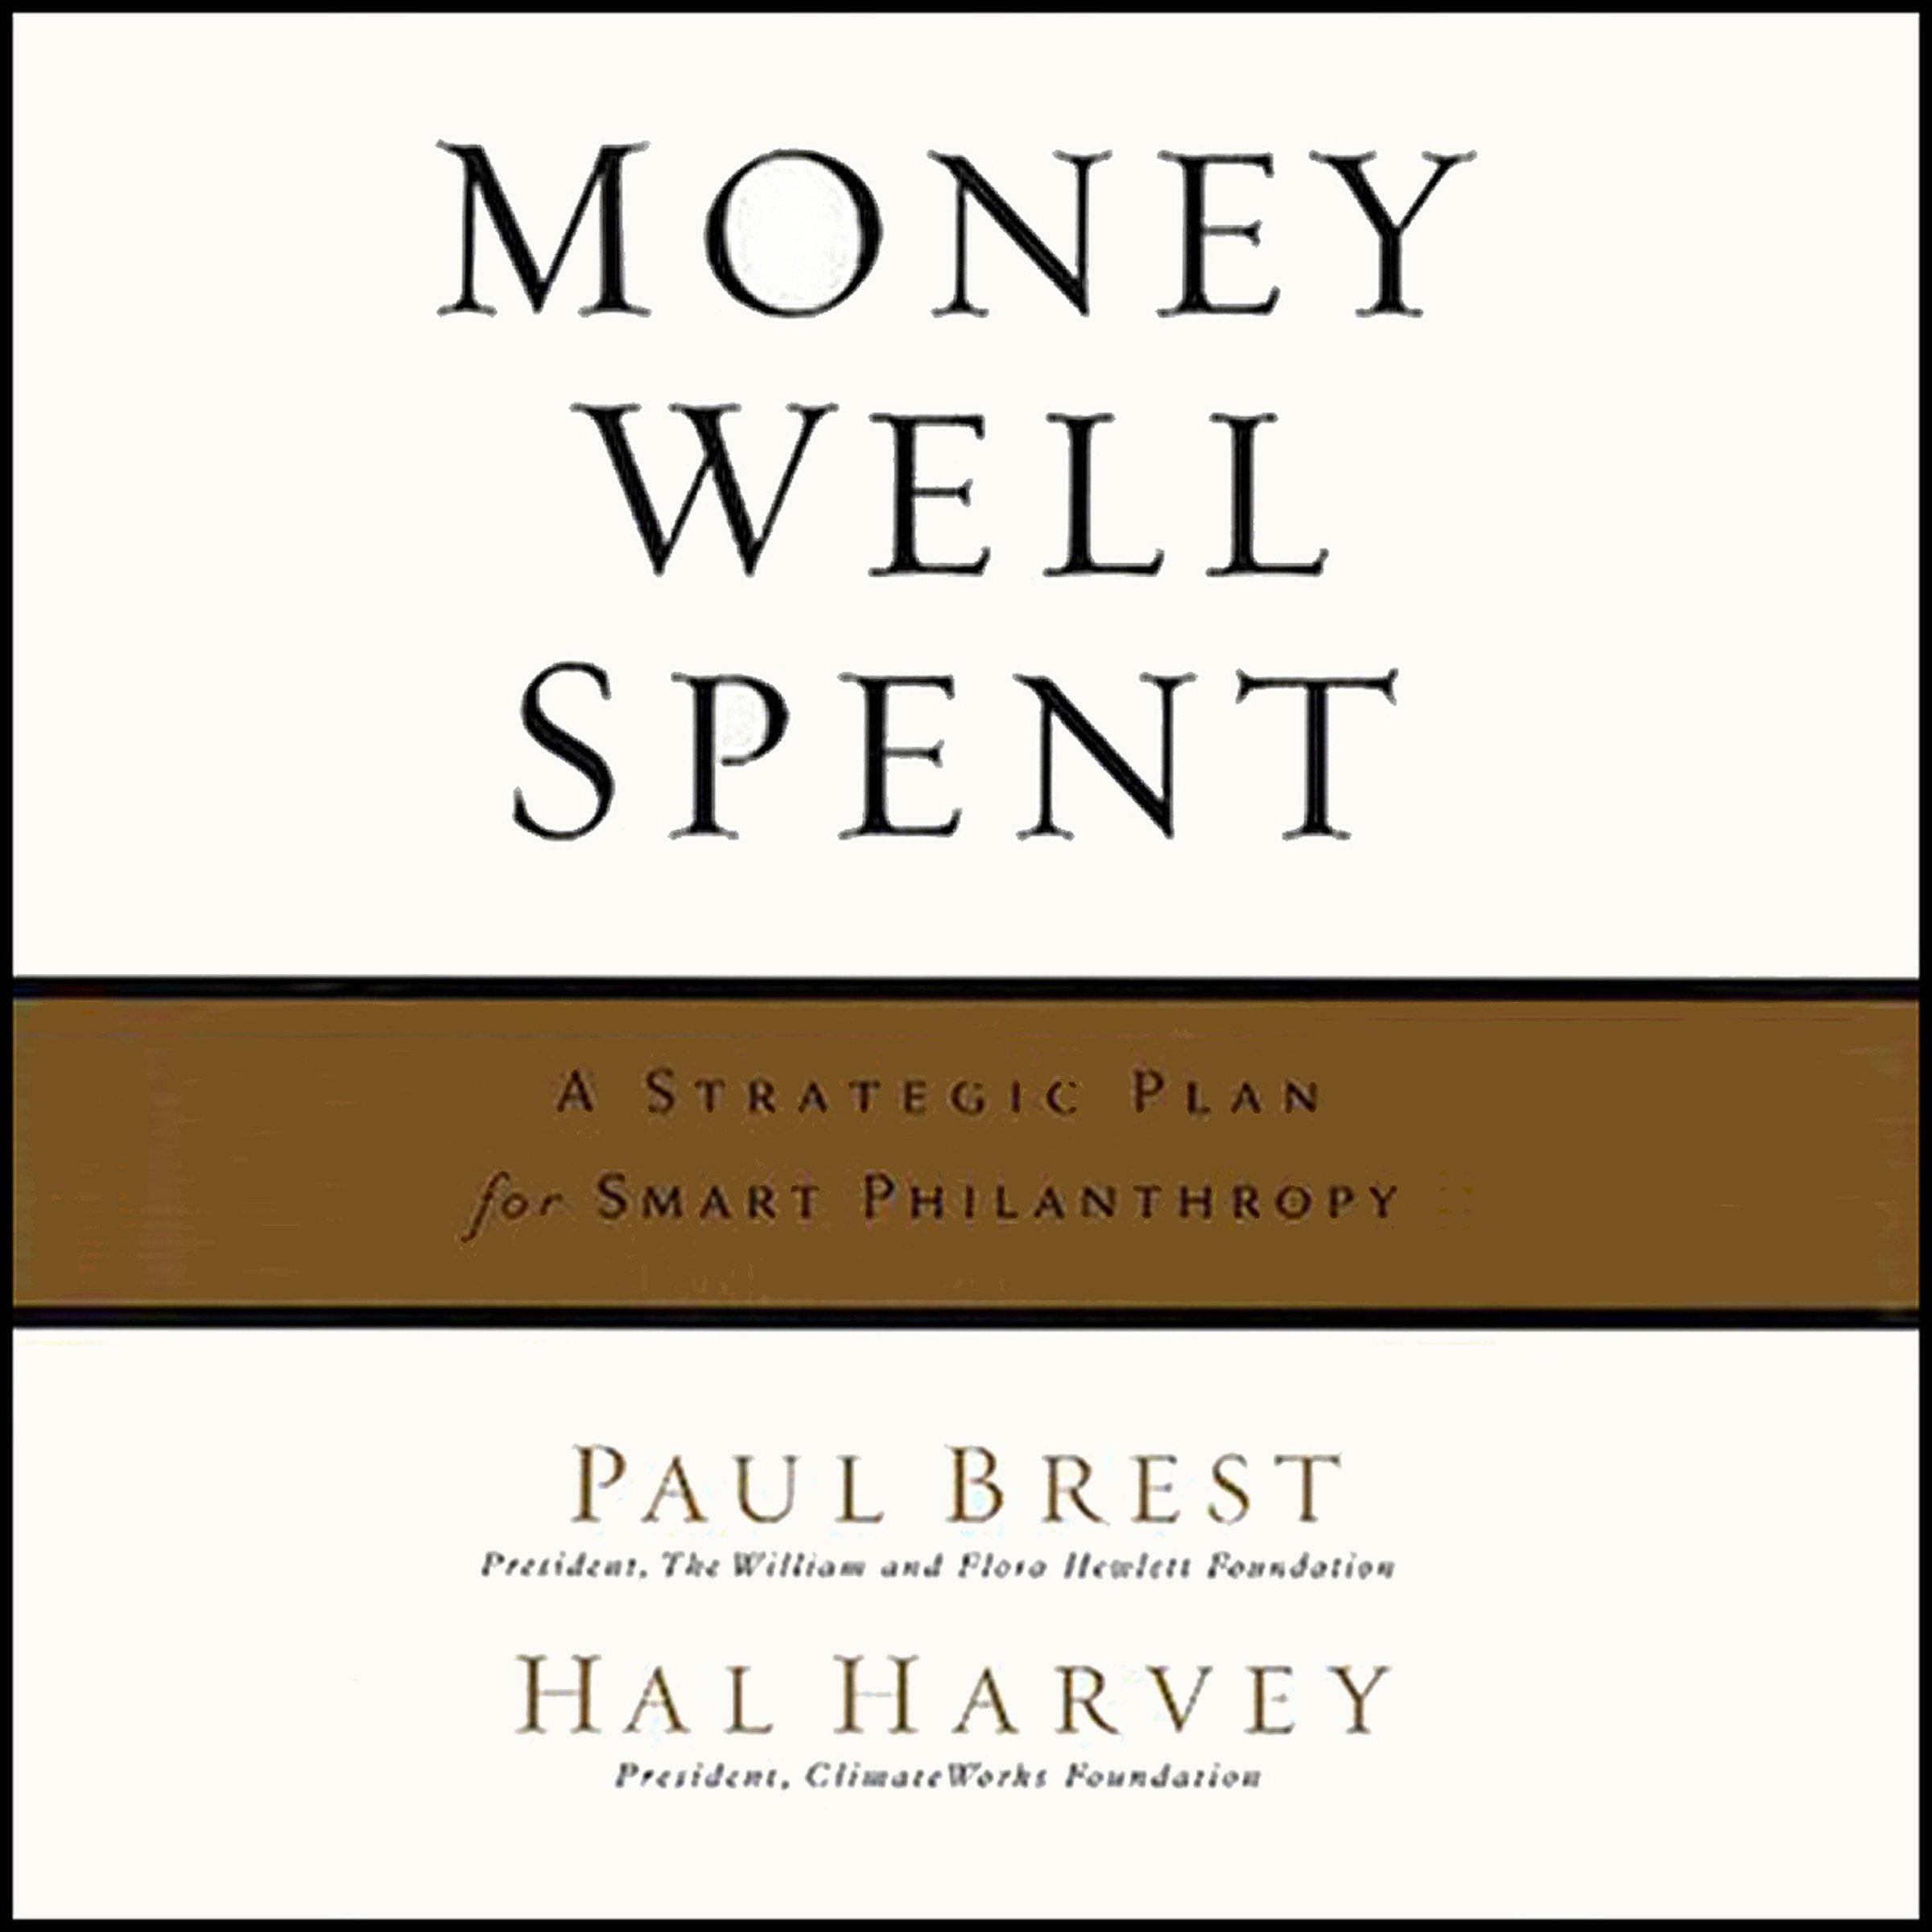 Money Well Spent : A Strategic Plan for Smart Philanthropy